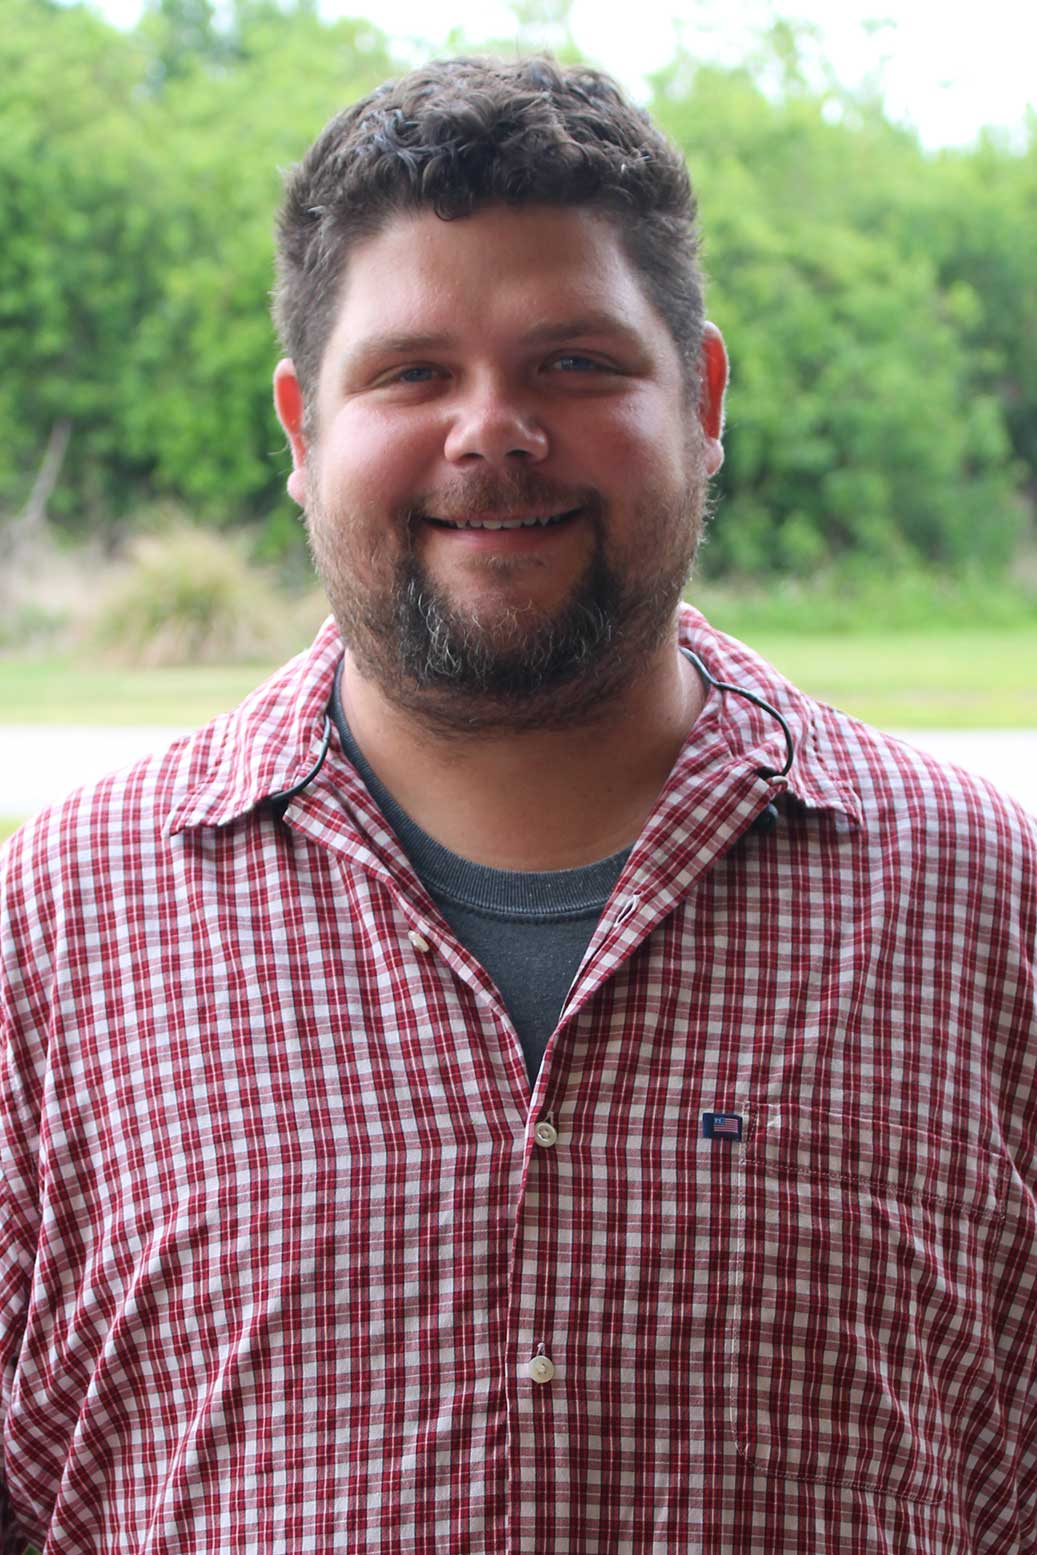 Micah Brewer